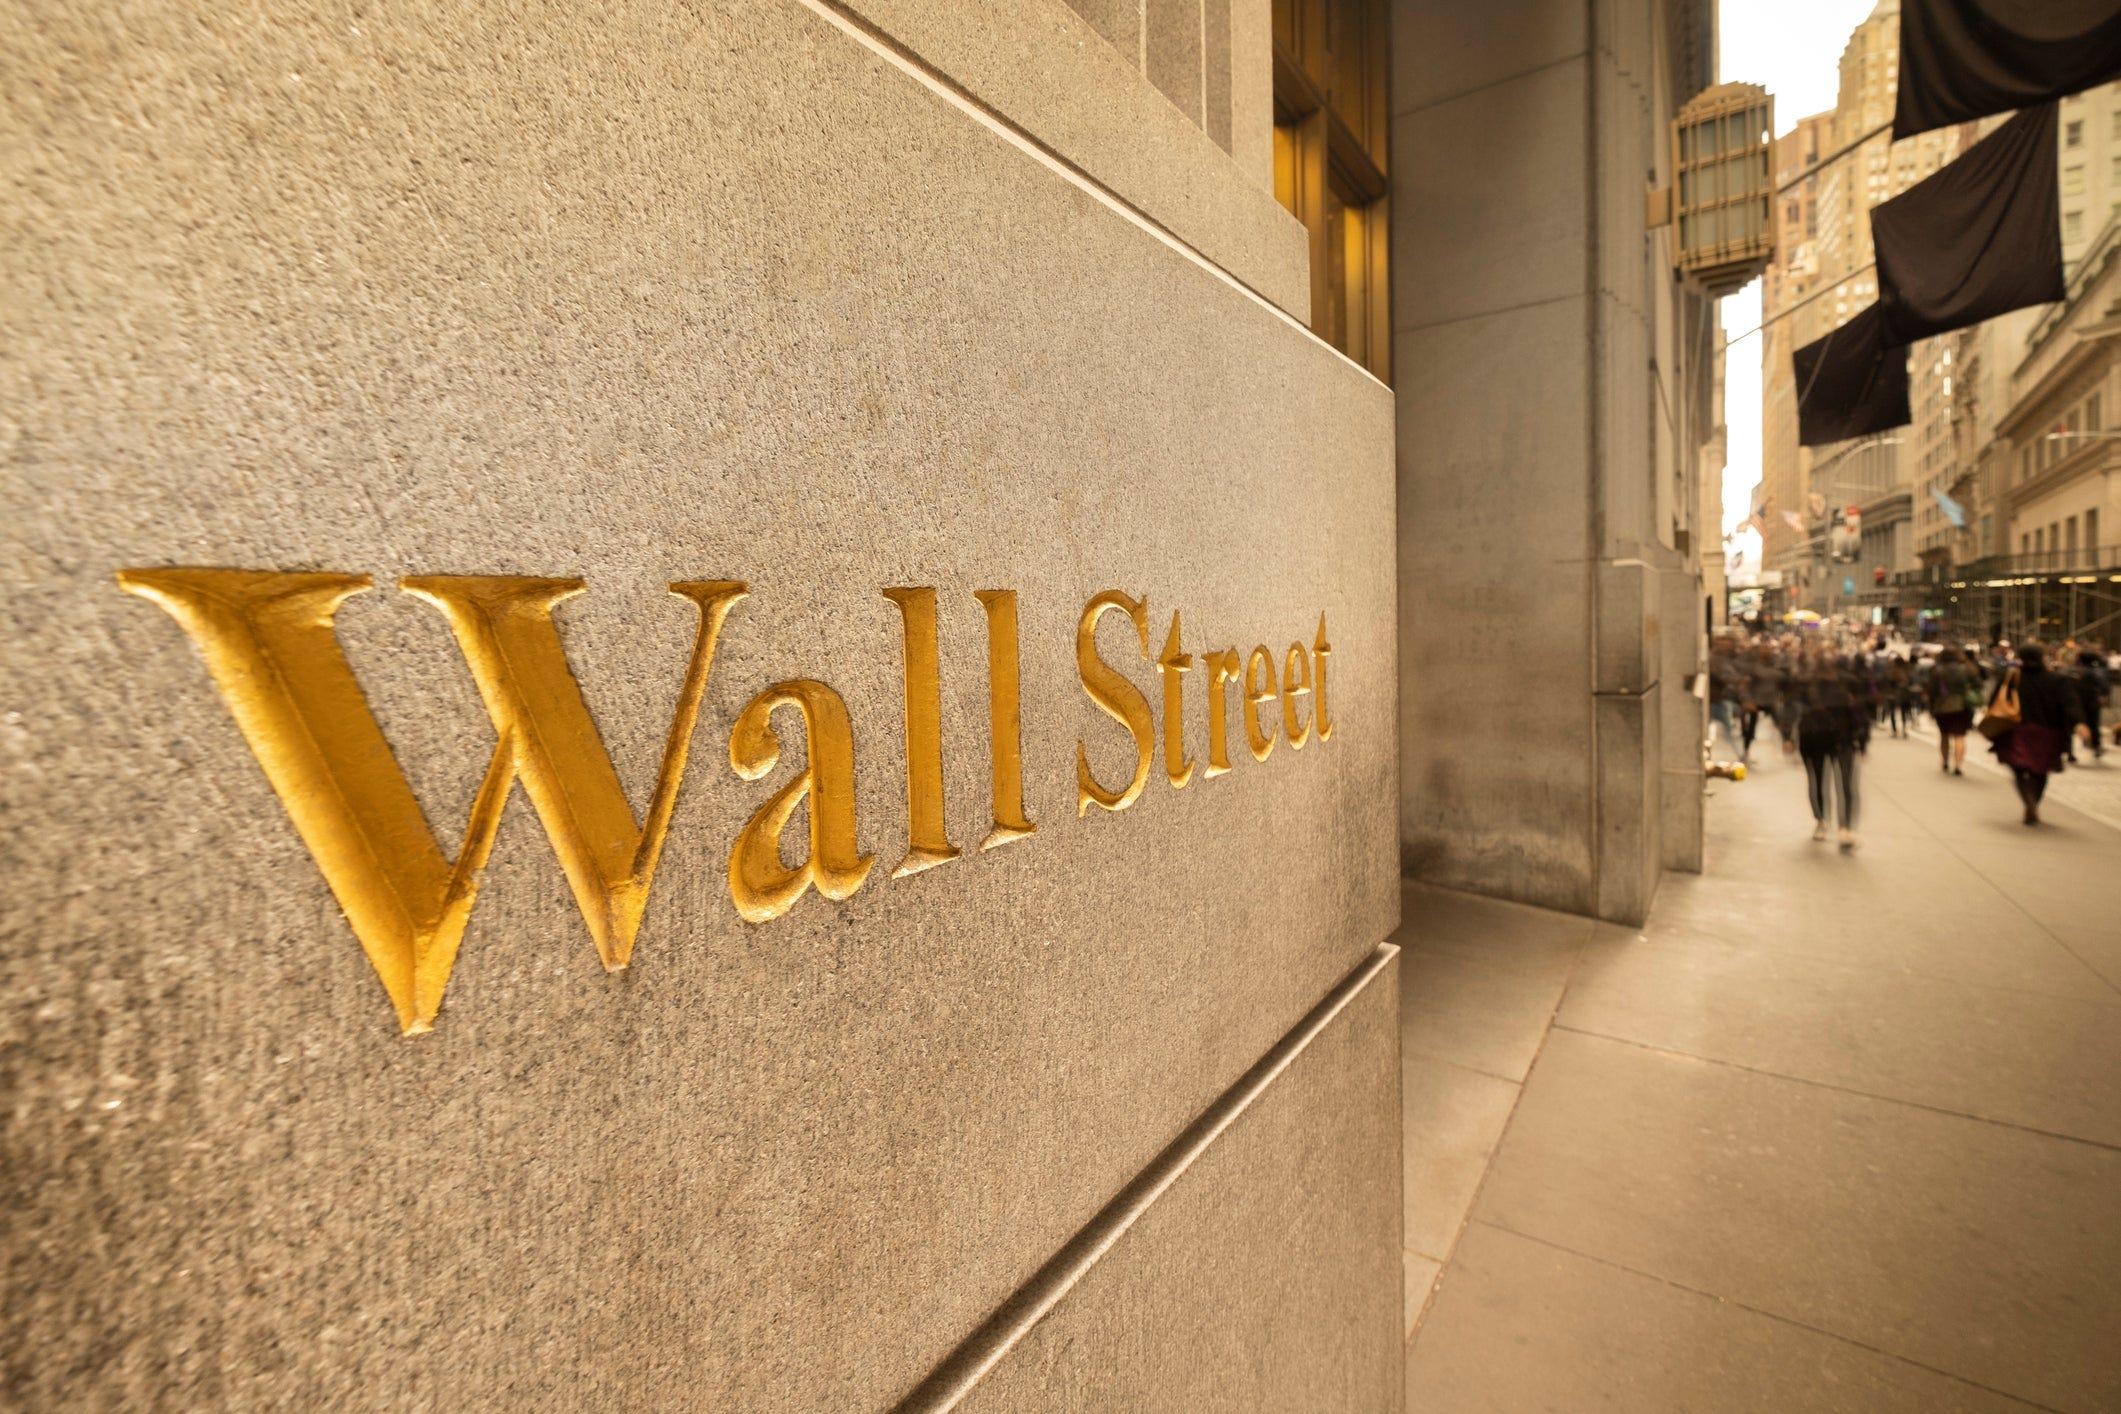 Stocks edge higher on Wall Street ahead of Fed statement